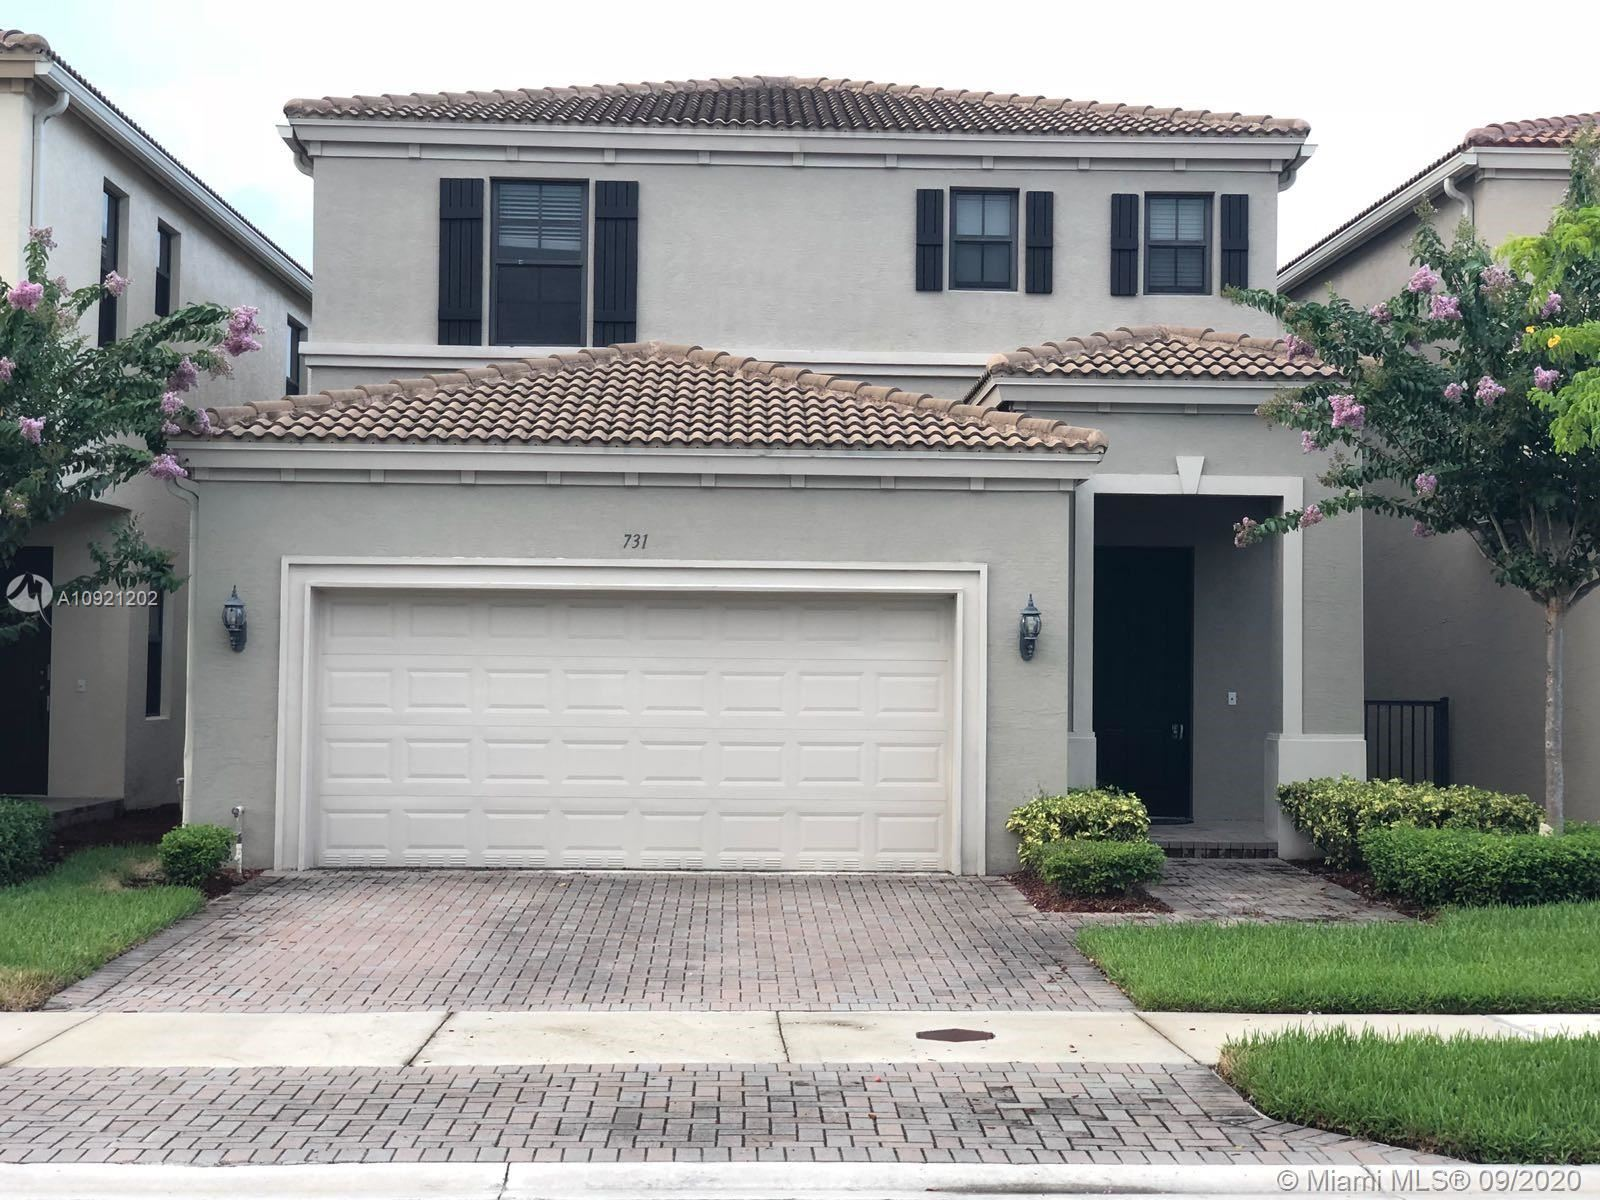 731 NE 193rd St, Miami, FL 33179 - #: A10921202